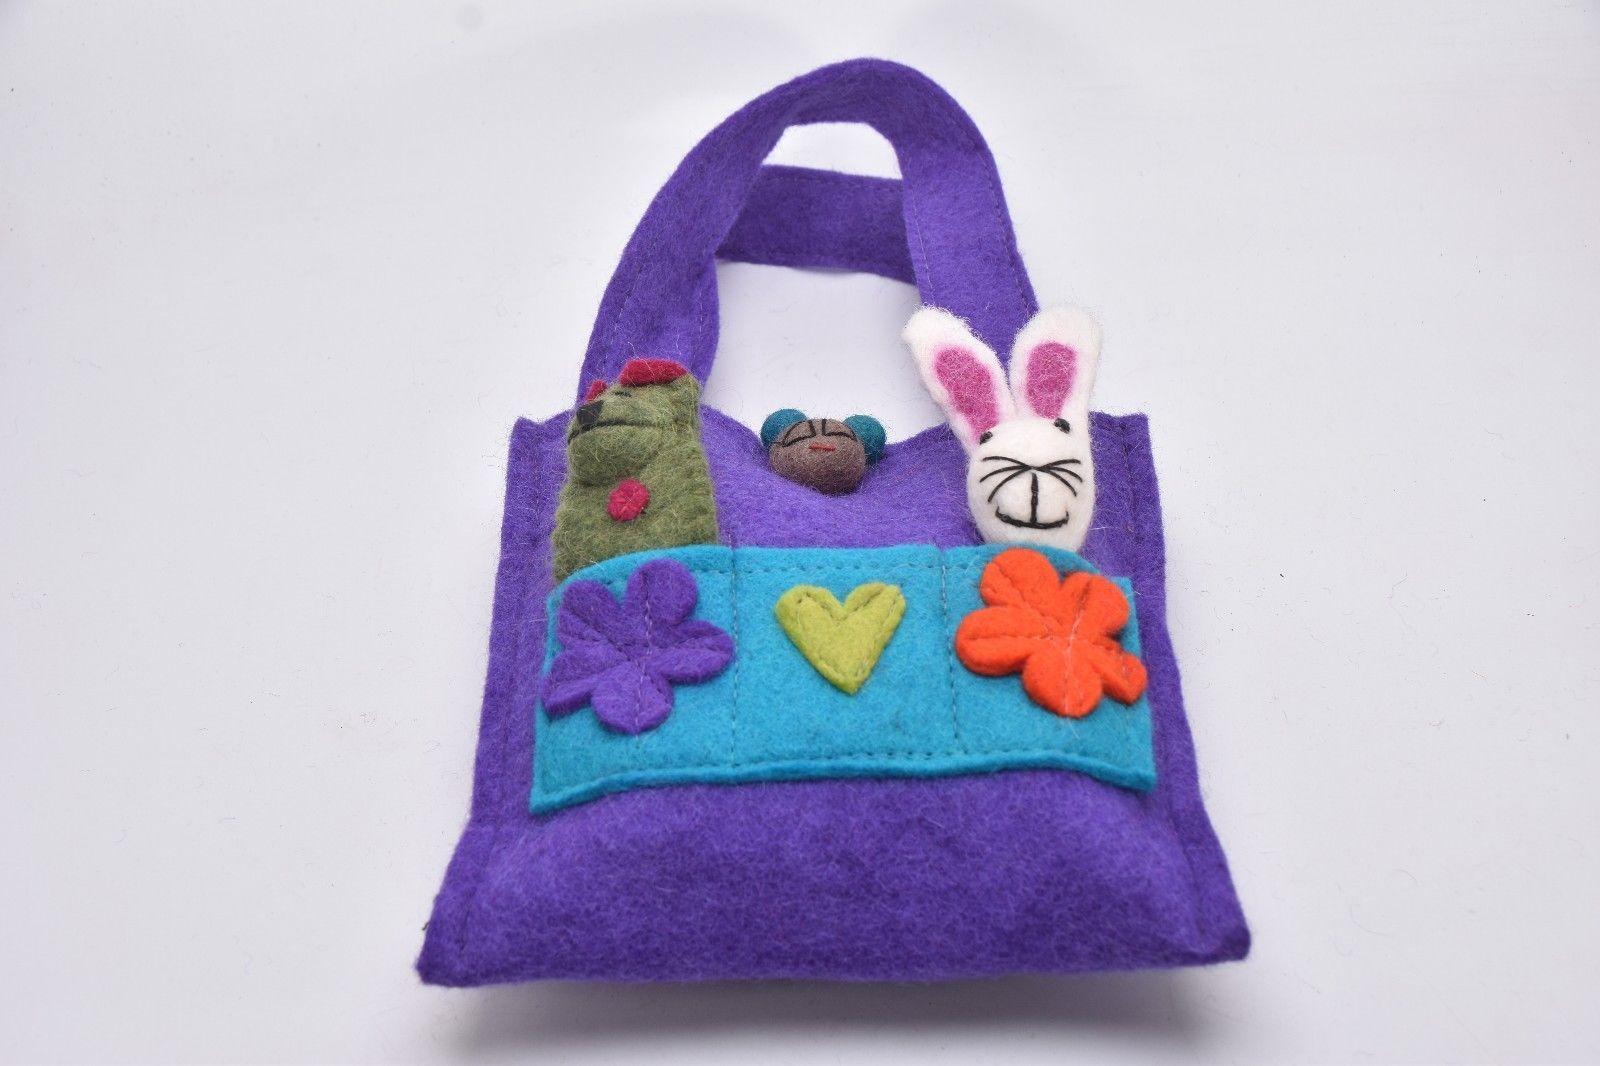 Purse hand Carry Bag Handmade With popet multi color Flower Felt bag purse Nepal